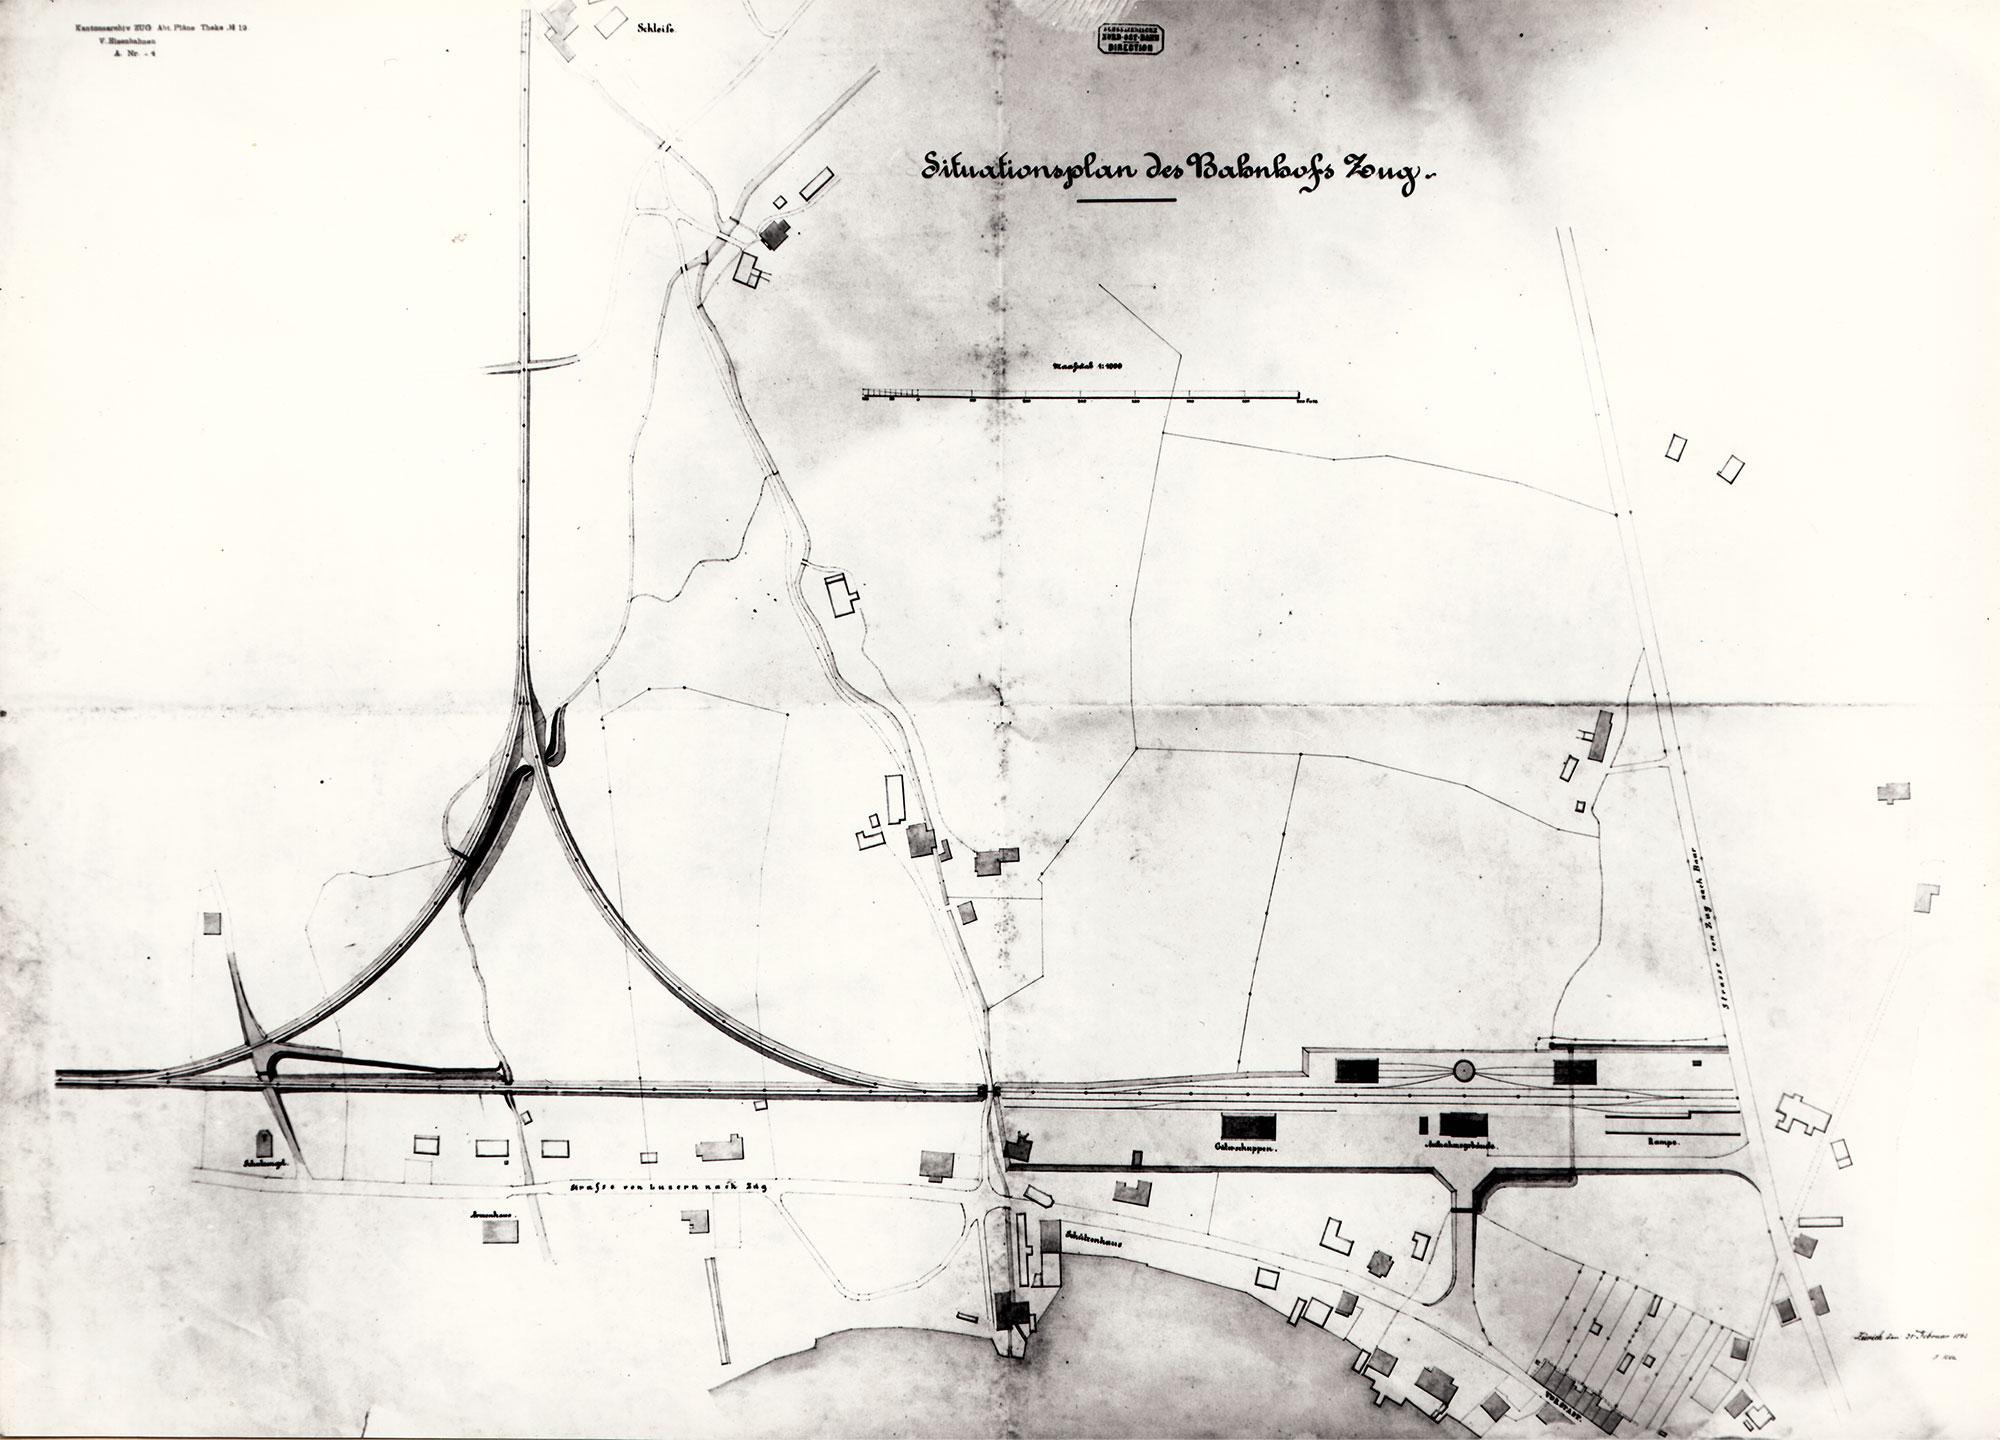 Bahnhof Zug Situationsplan 1863